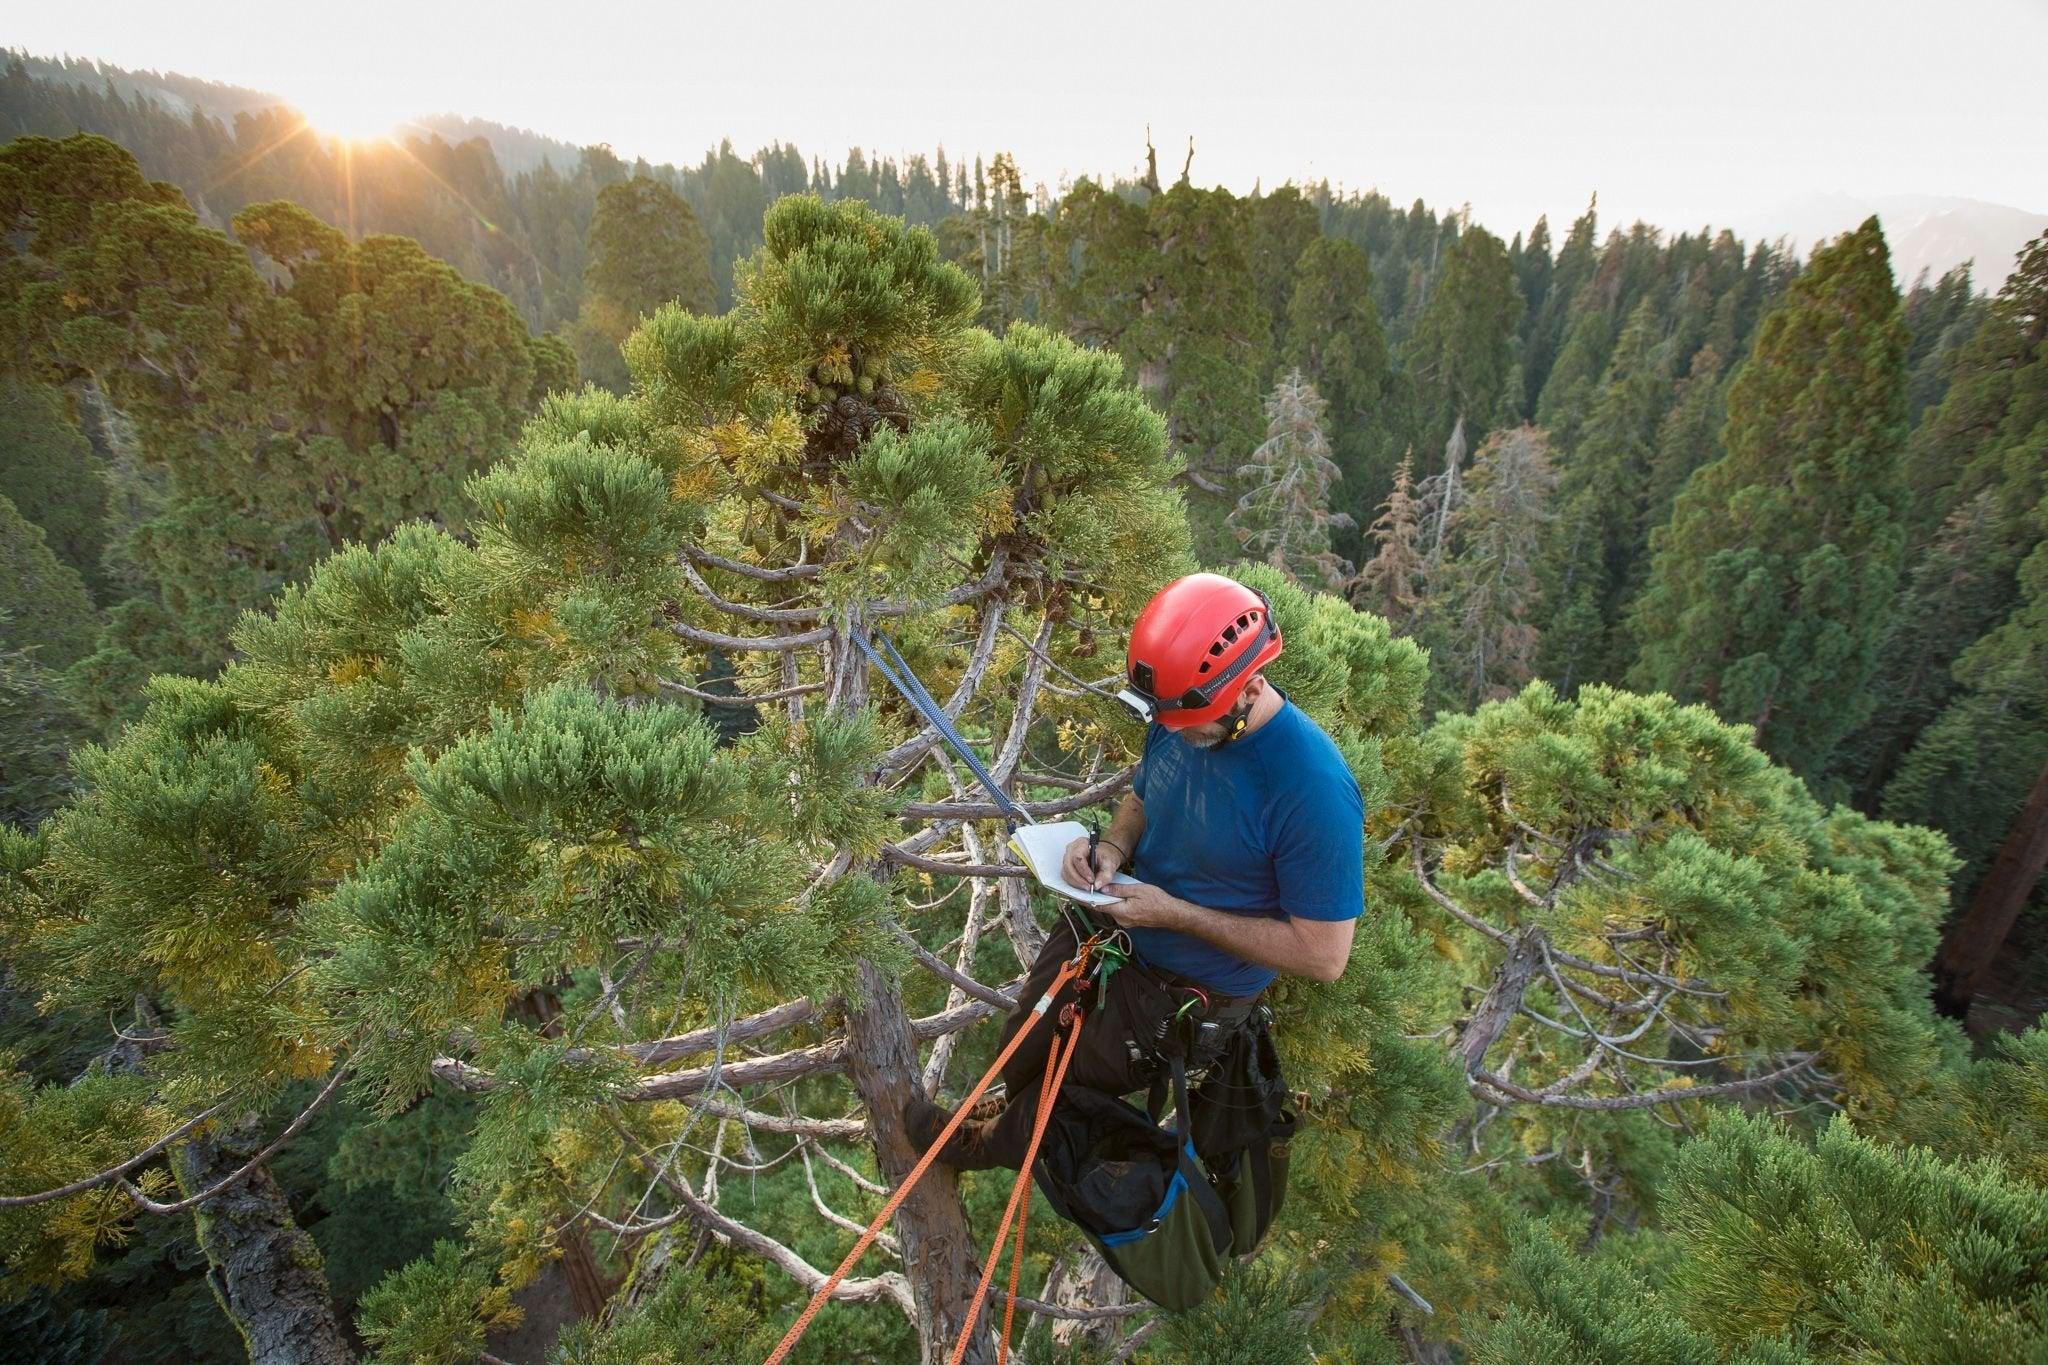 Are Giant Sequoia Trees Succumbing to Drought? - Scientific American